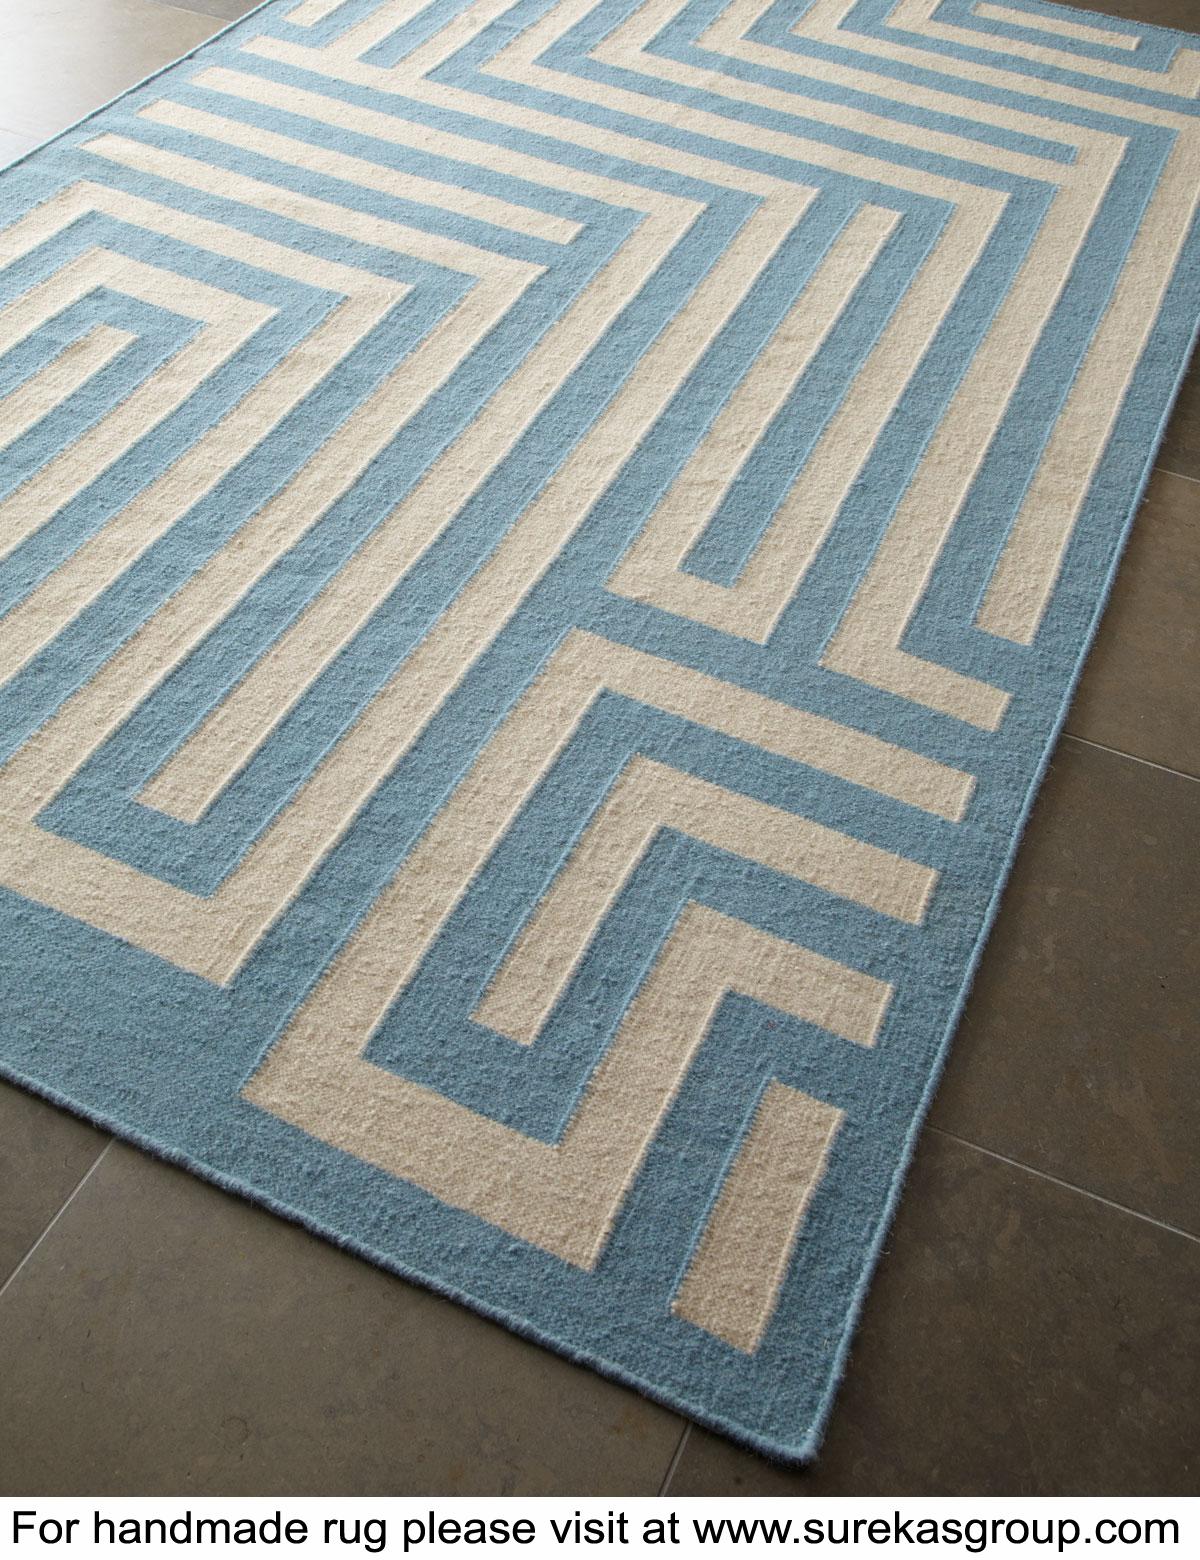 Handmade rugs and carpets india, custom handmade carpet ...